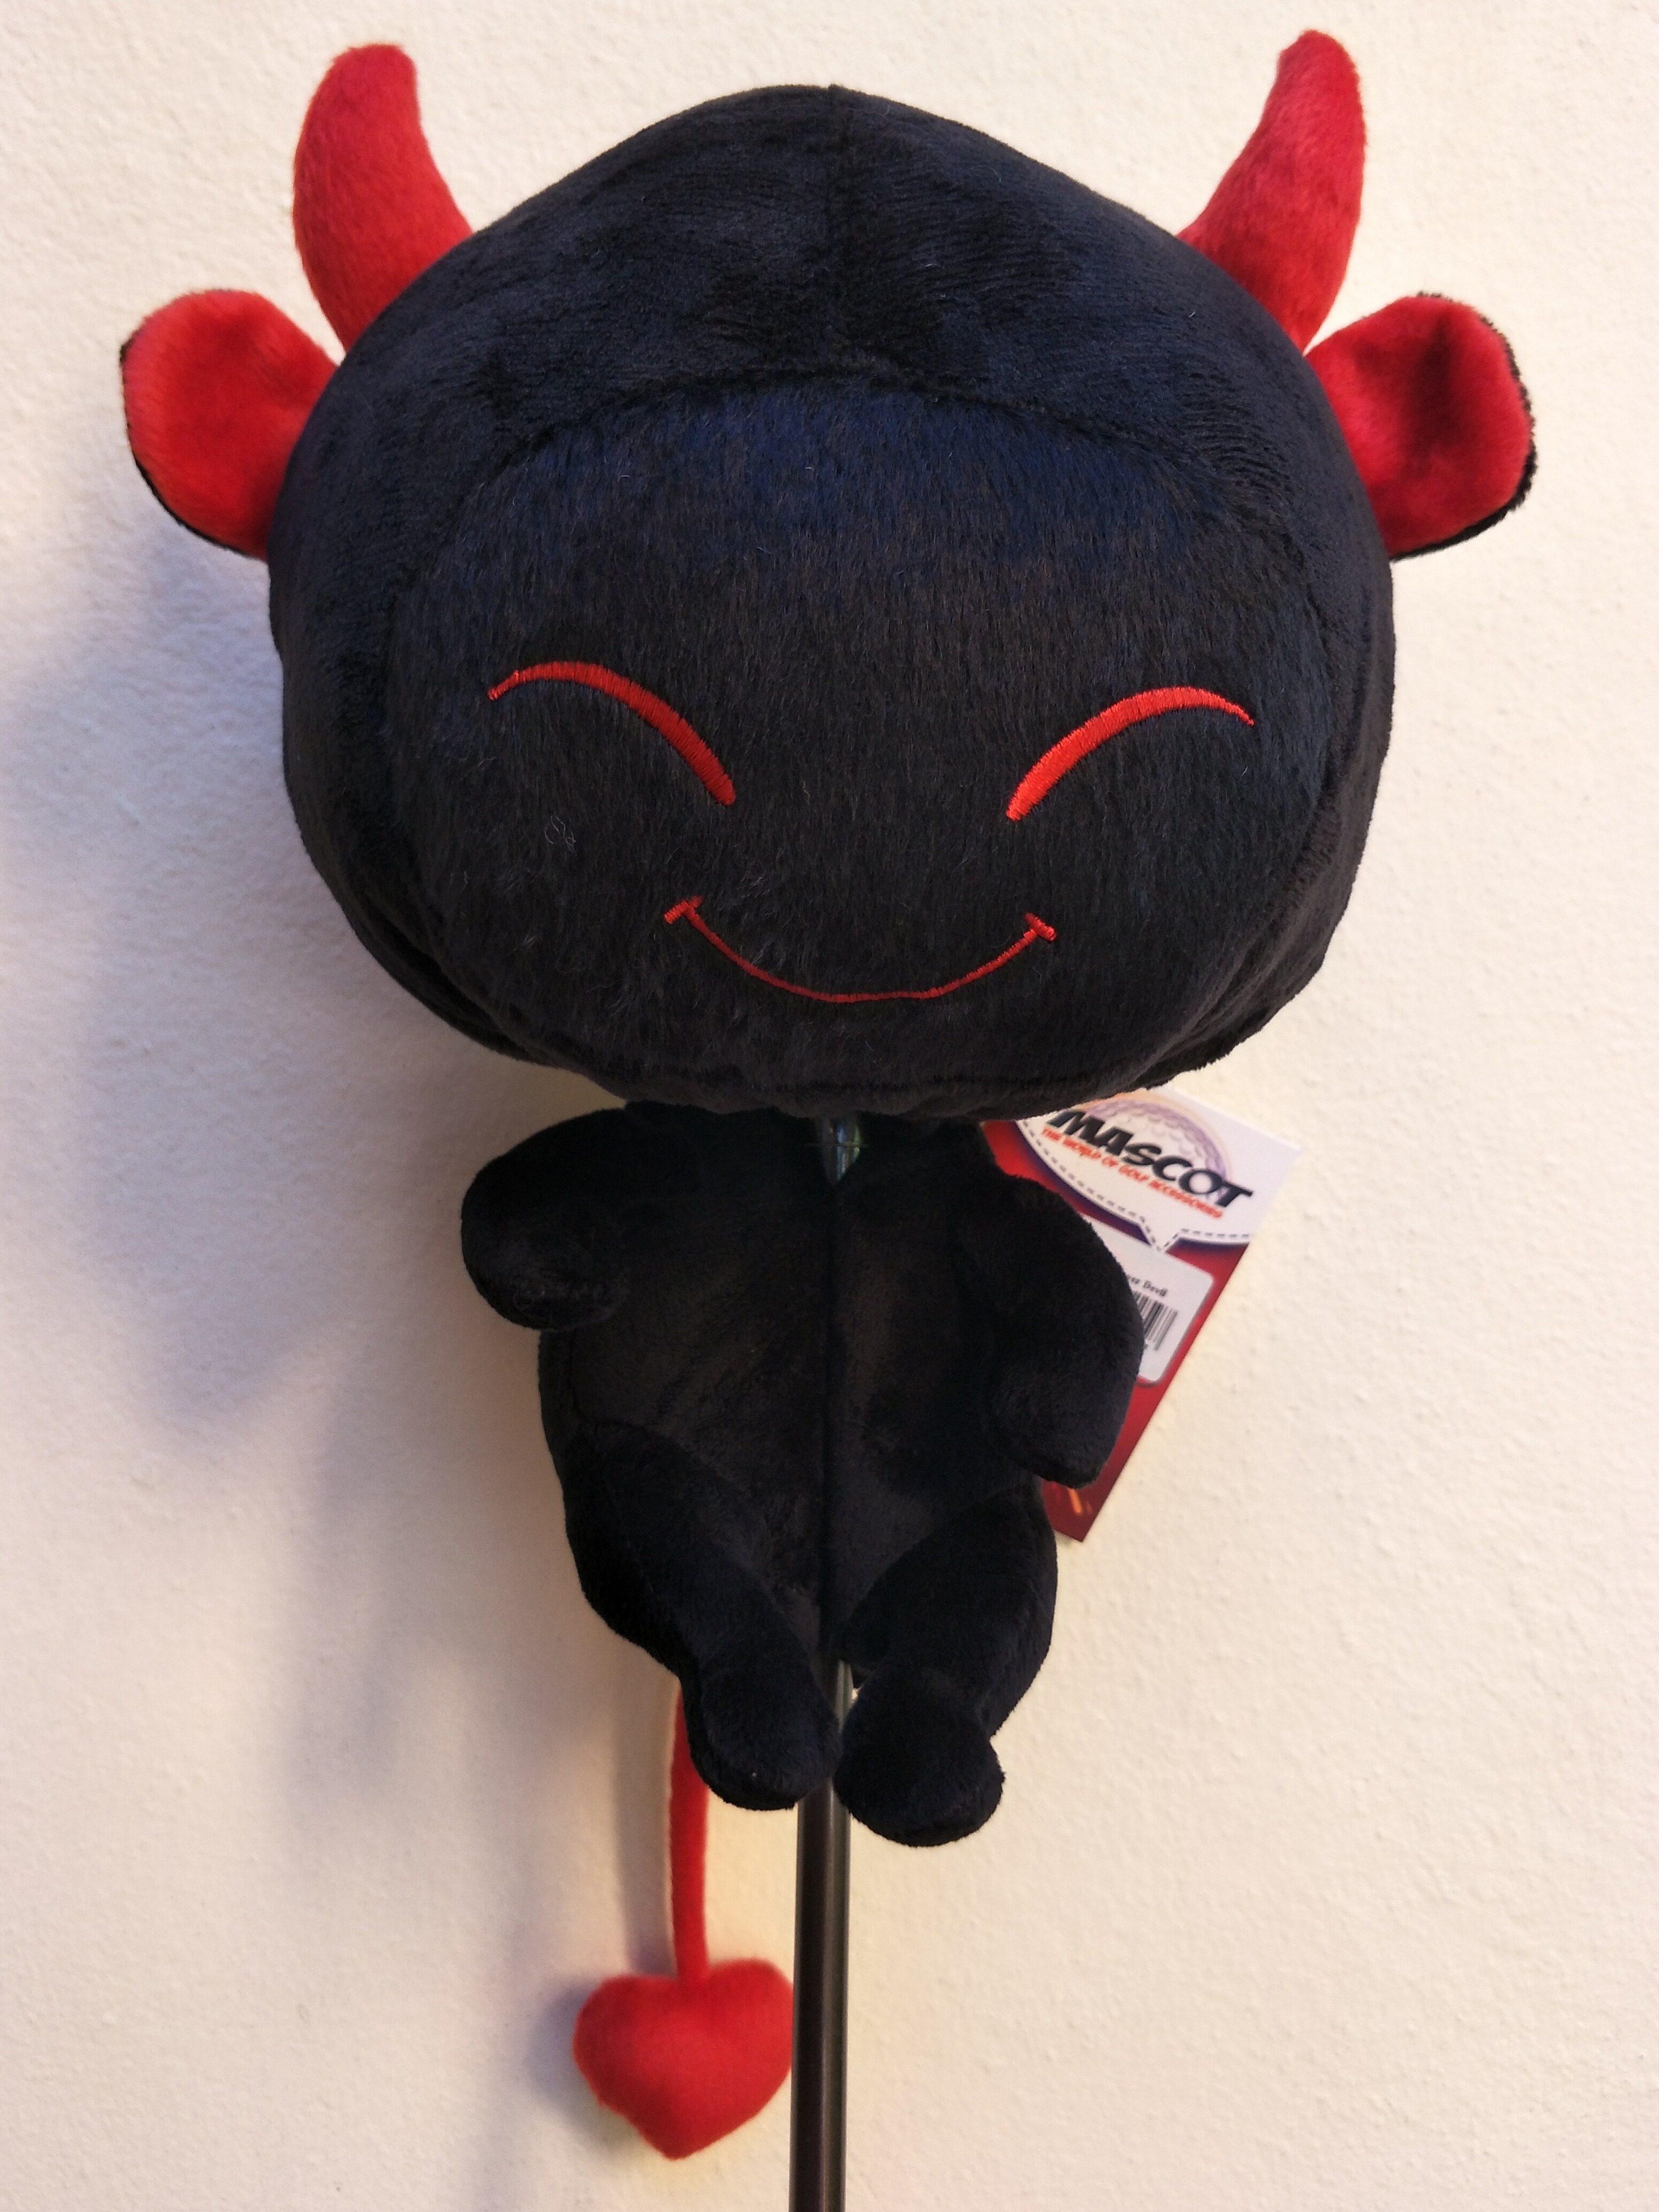 Wood Cover Devil CLC (Size L) สำหรับหัวไม้ 1(Driver) ที่ครอบหัวไม้กอล์ฟ(ตัวใหญ่) สีแดง สีดำ สีชมพู